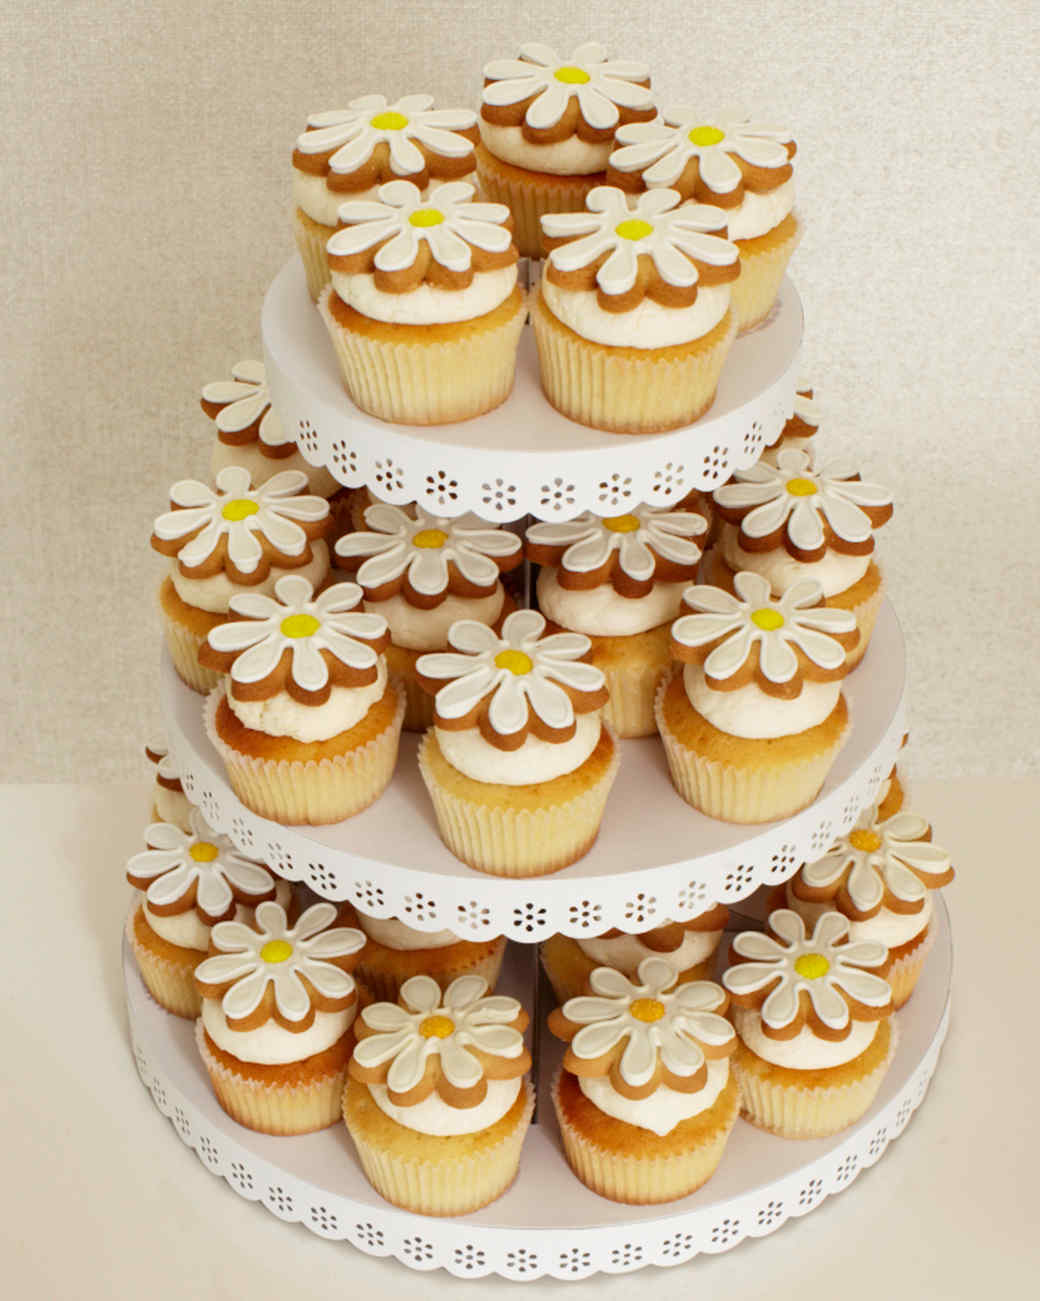 daisy-cupcake-stand-095-wd109097.jpg